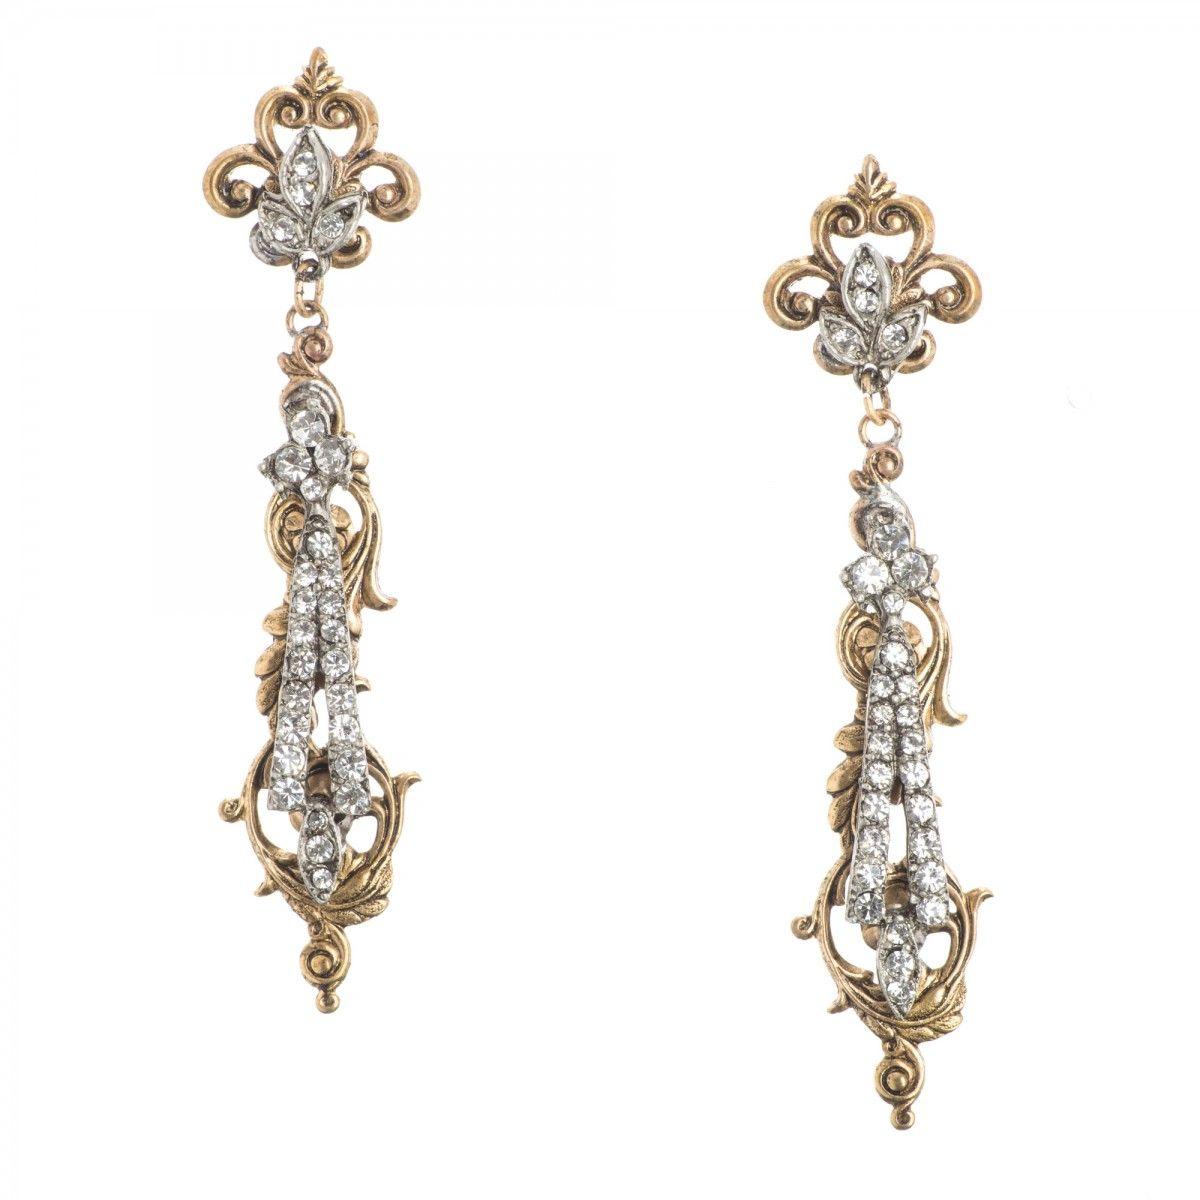 Miss Ellie Nyc Earrings Silver Gold Ragtime Crystal Chandeliers Jewelry